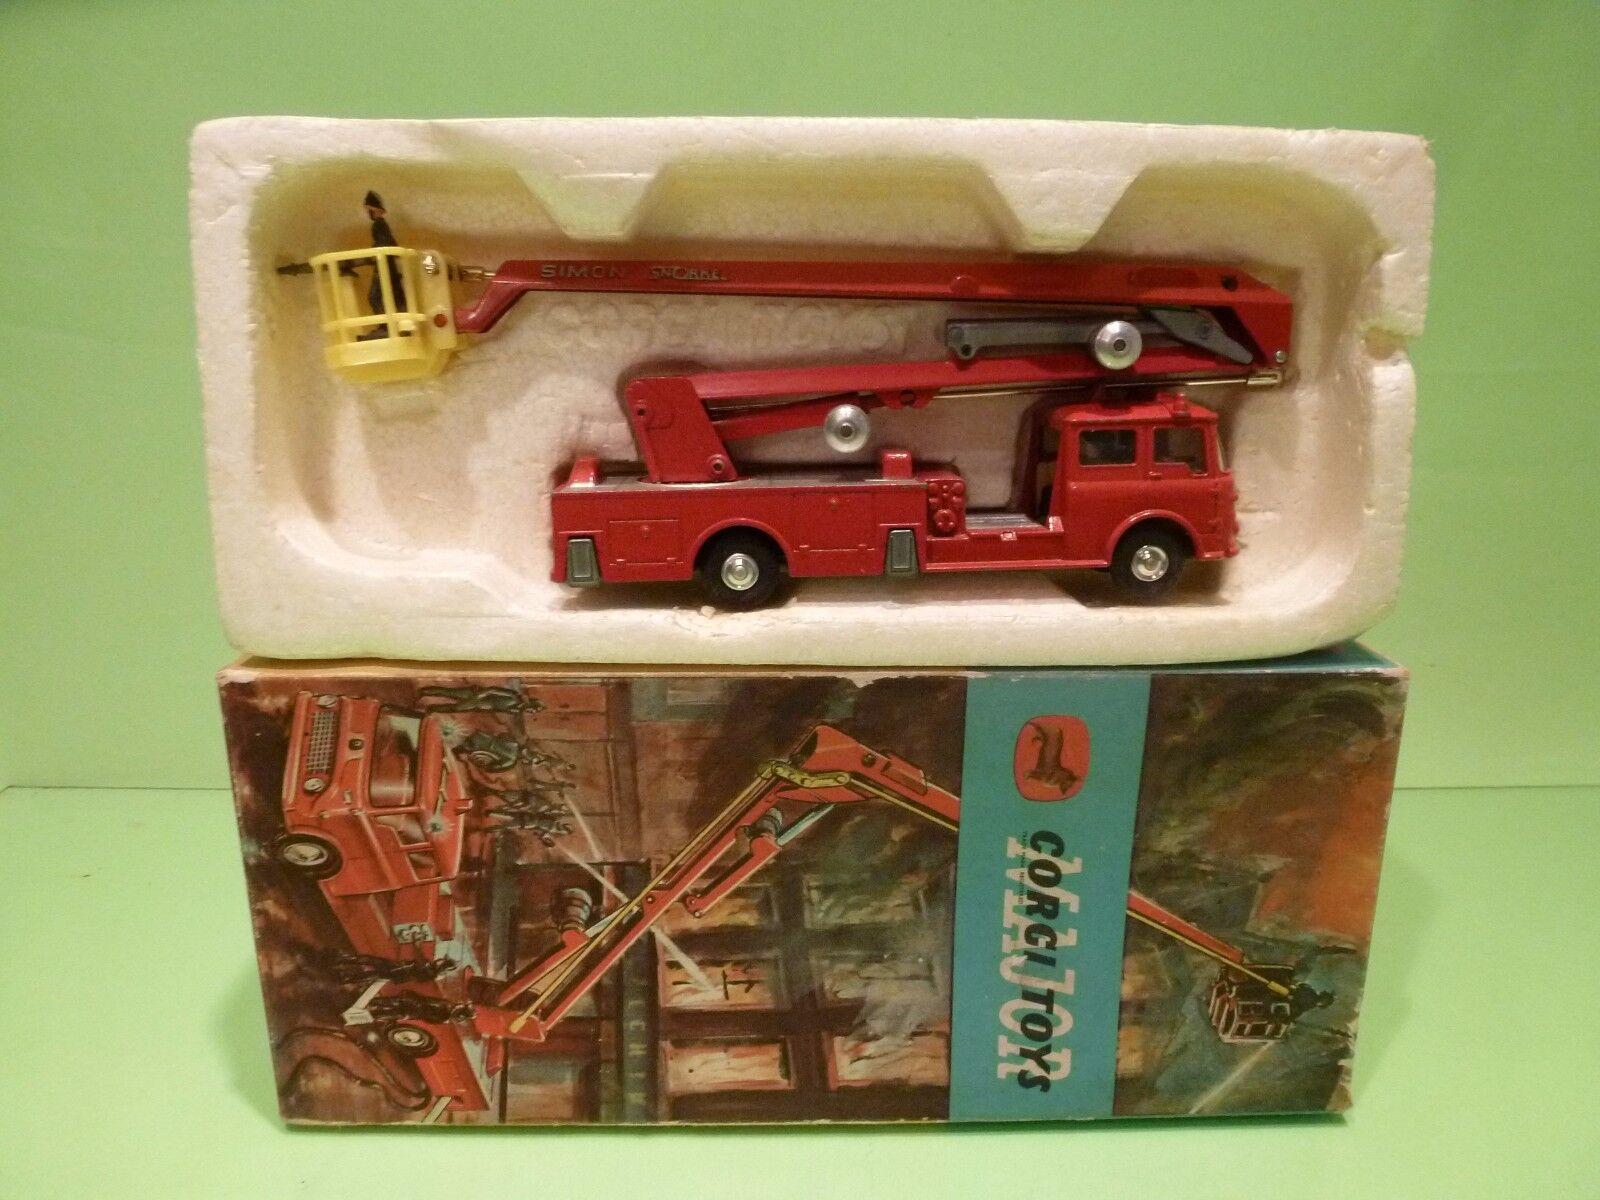 CORGI TOYS 1127 BEDFORD SIMON SNORKEL FIRE ENGINE - rot - GOOD CONDITION IN BOX